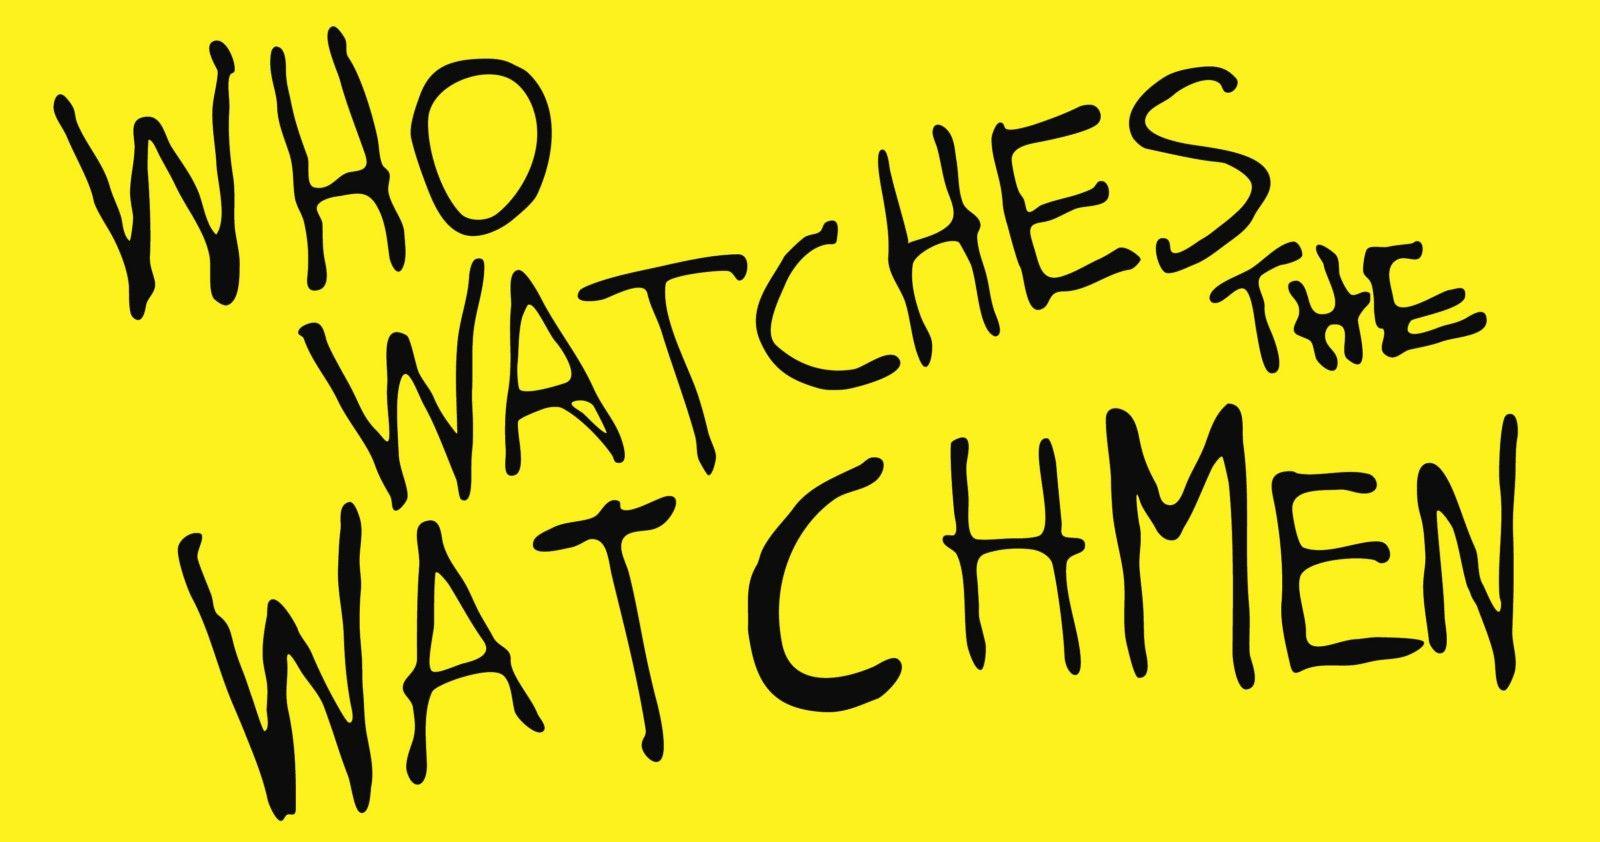 fe38da1b9 Who watches the Watchmen? | Geek Stuff | Quis custodiet ipsos ...